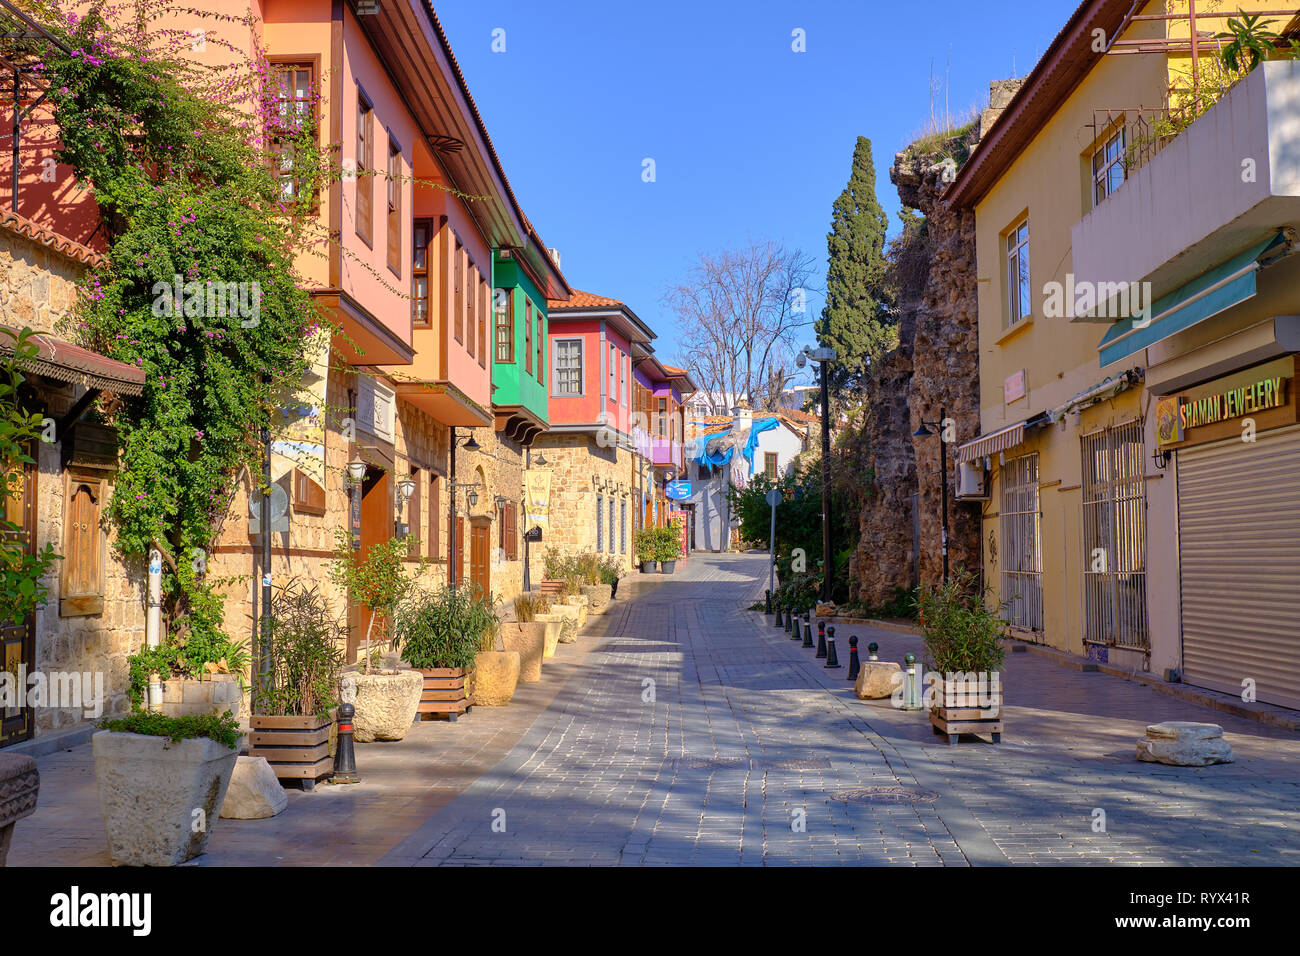 Antalya old town street with typical architecture. Antalya, Turkey - Stock Photo